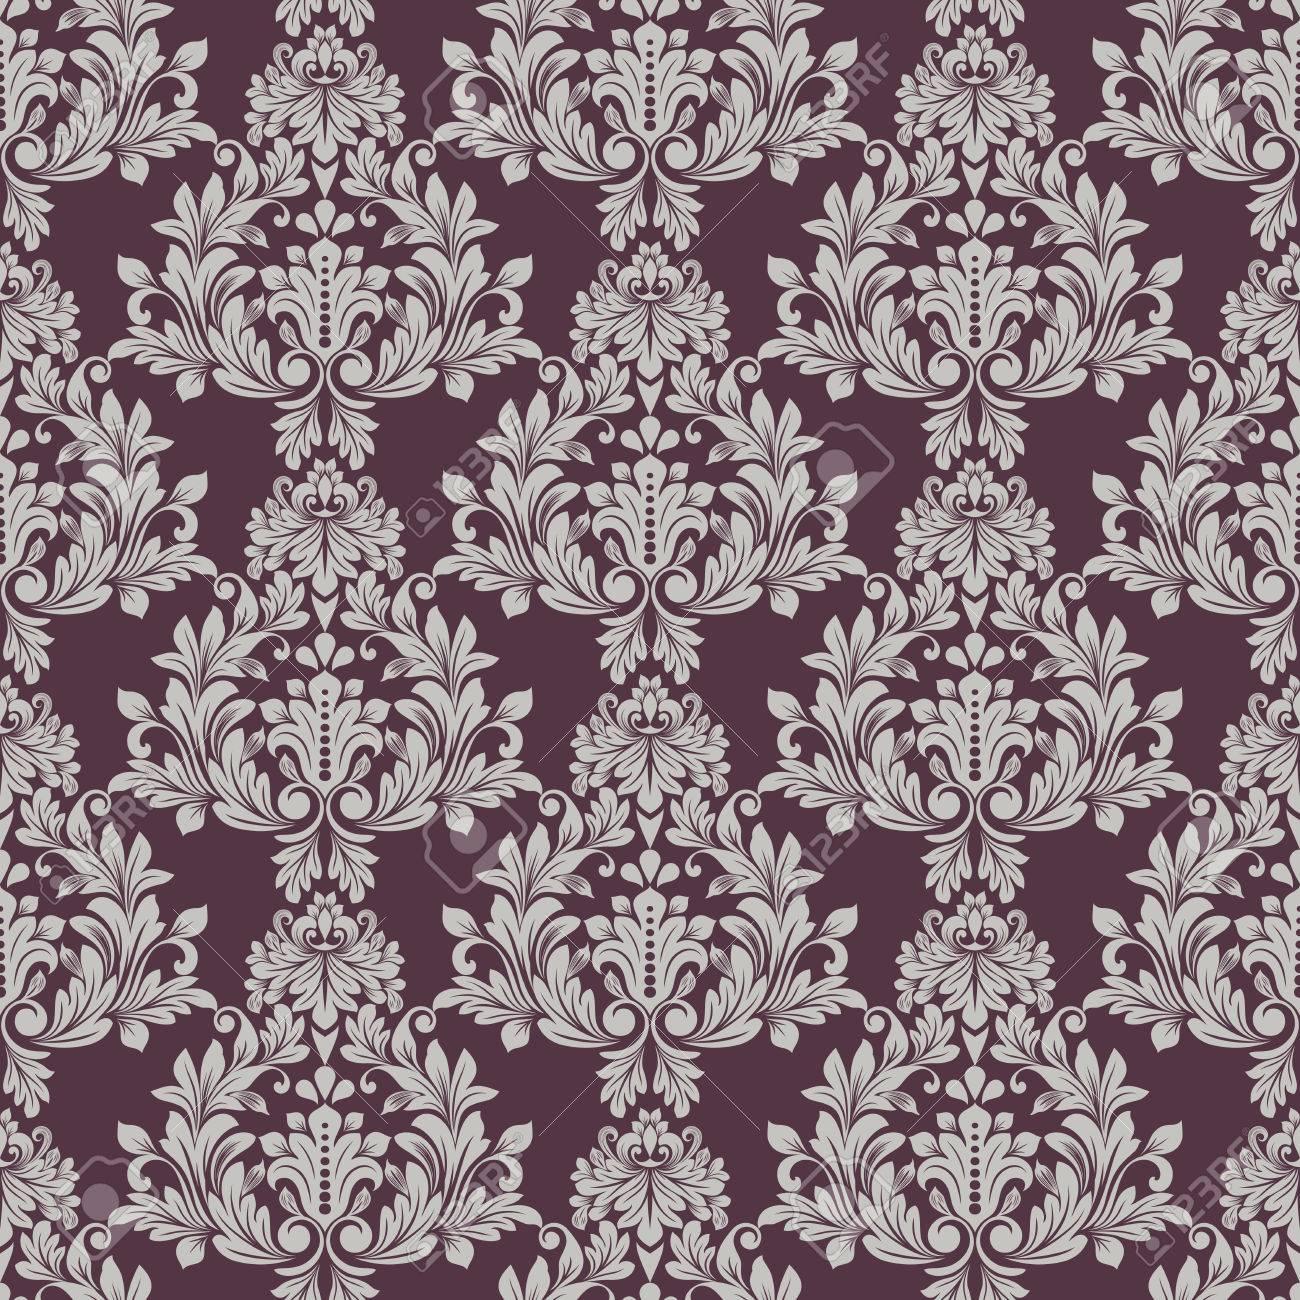 Seamless Grey And Dark Purple Floral Wallpaper Vector Background Vintage Damask Pattern Backdrop Stock